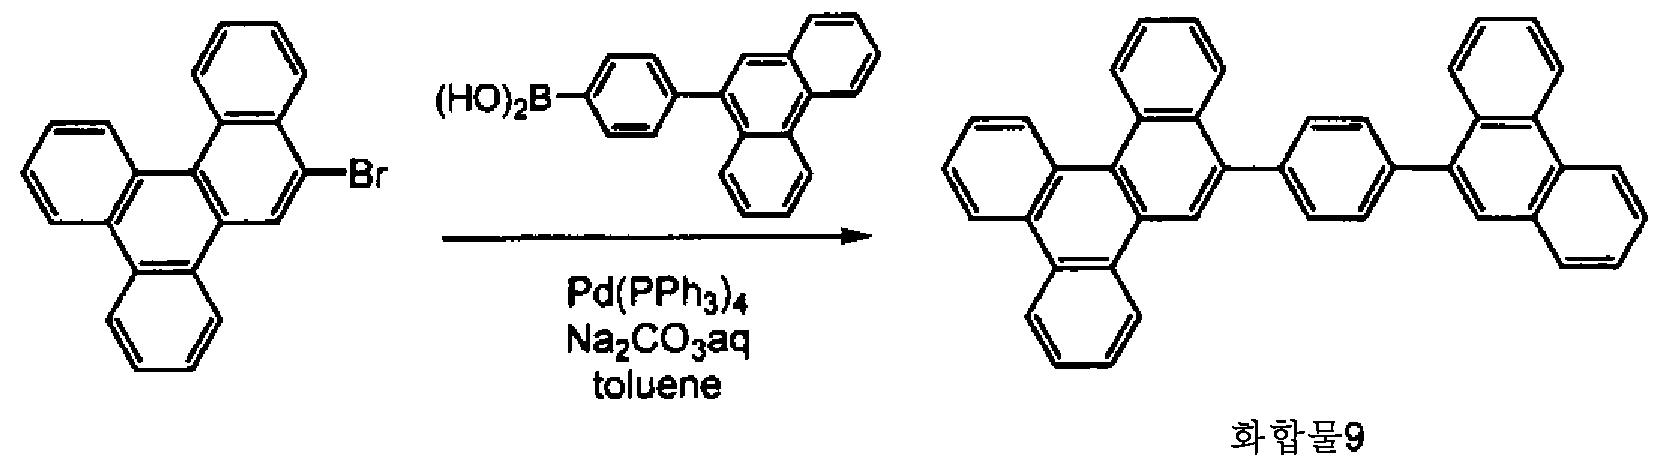 Figure 112010031772612-pct00058